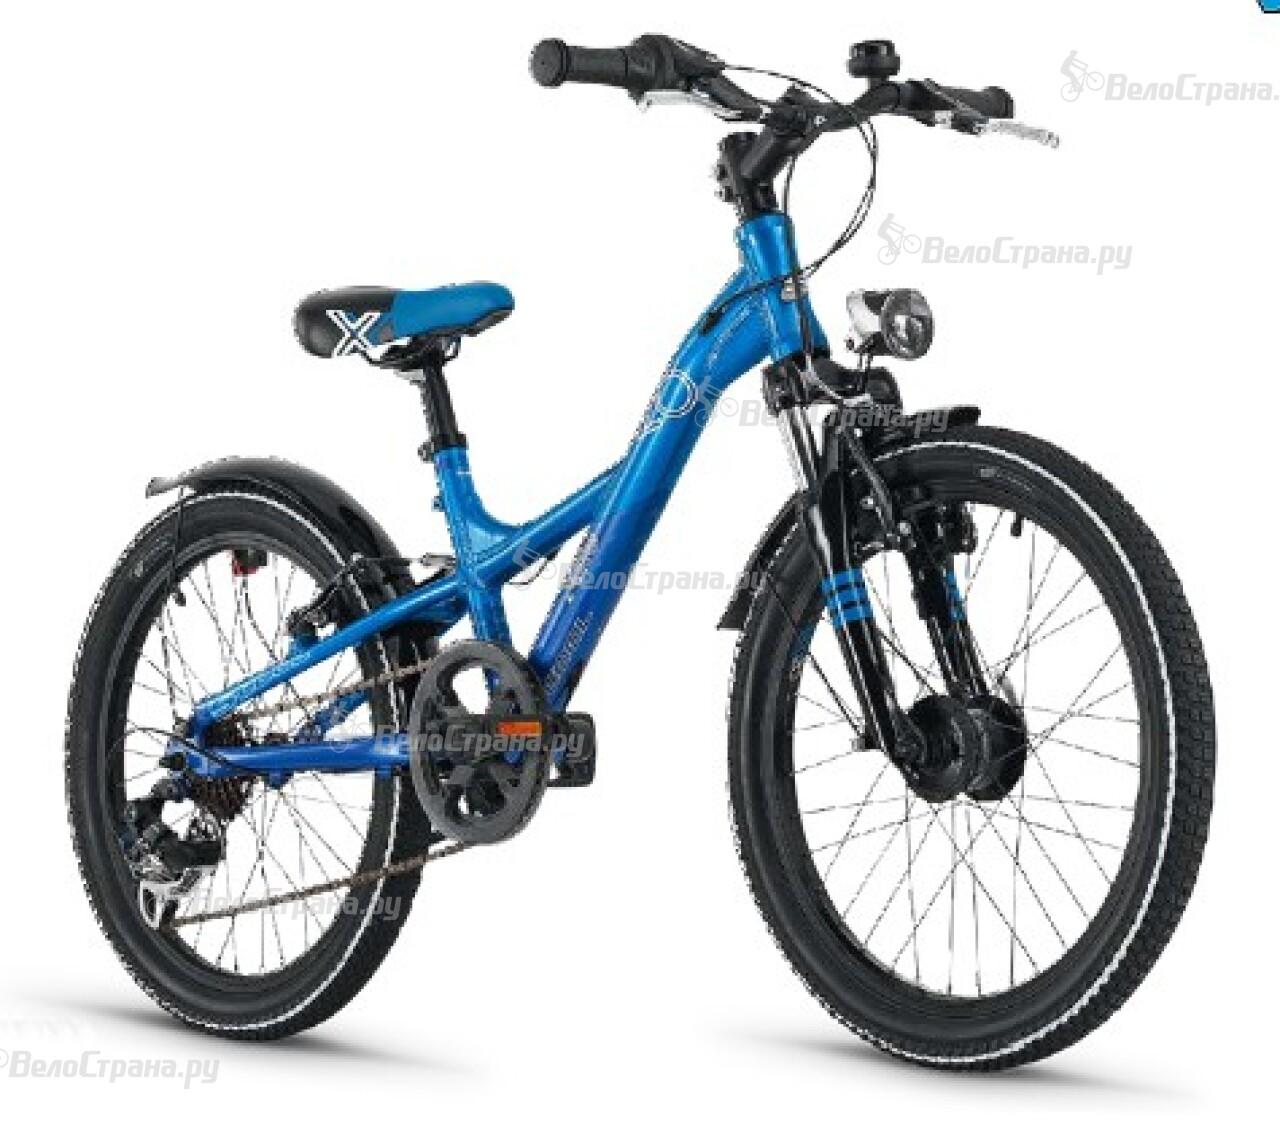 Велосипед Scool XX lite 20 7S (2014) цена